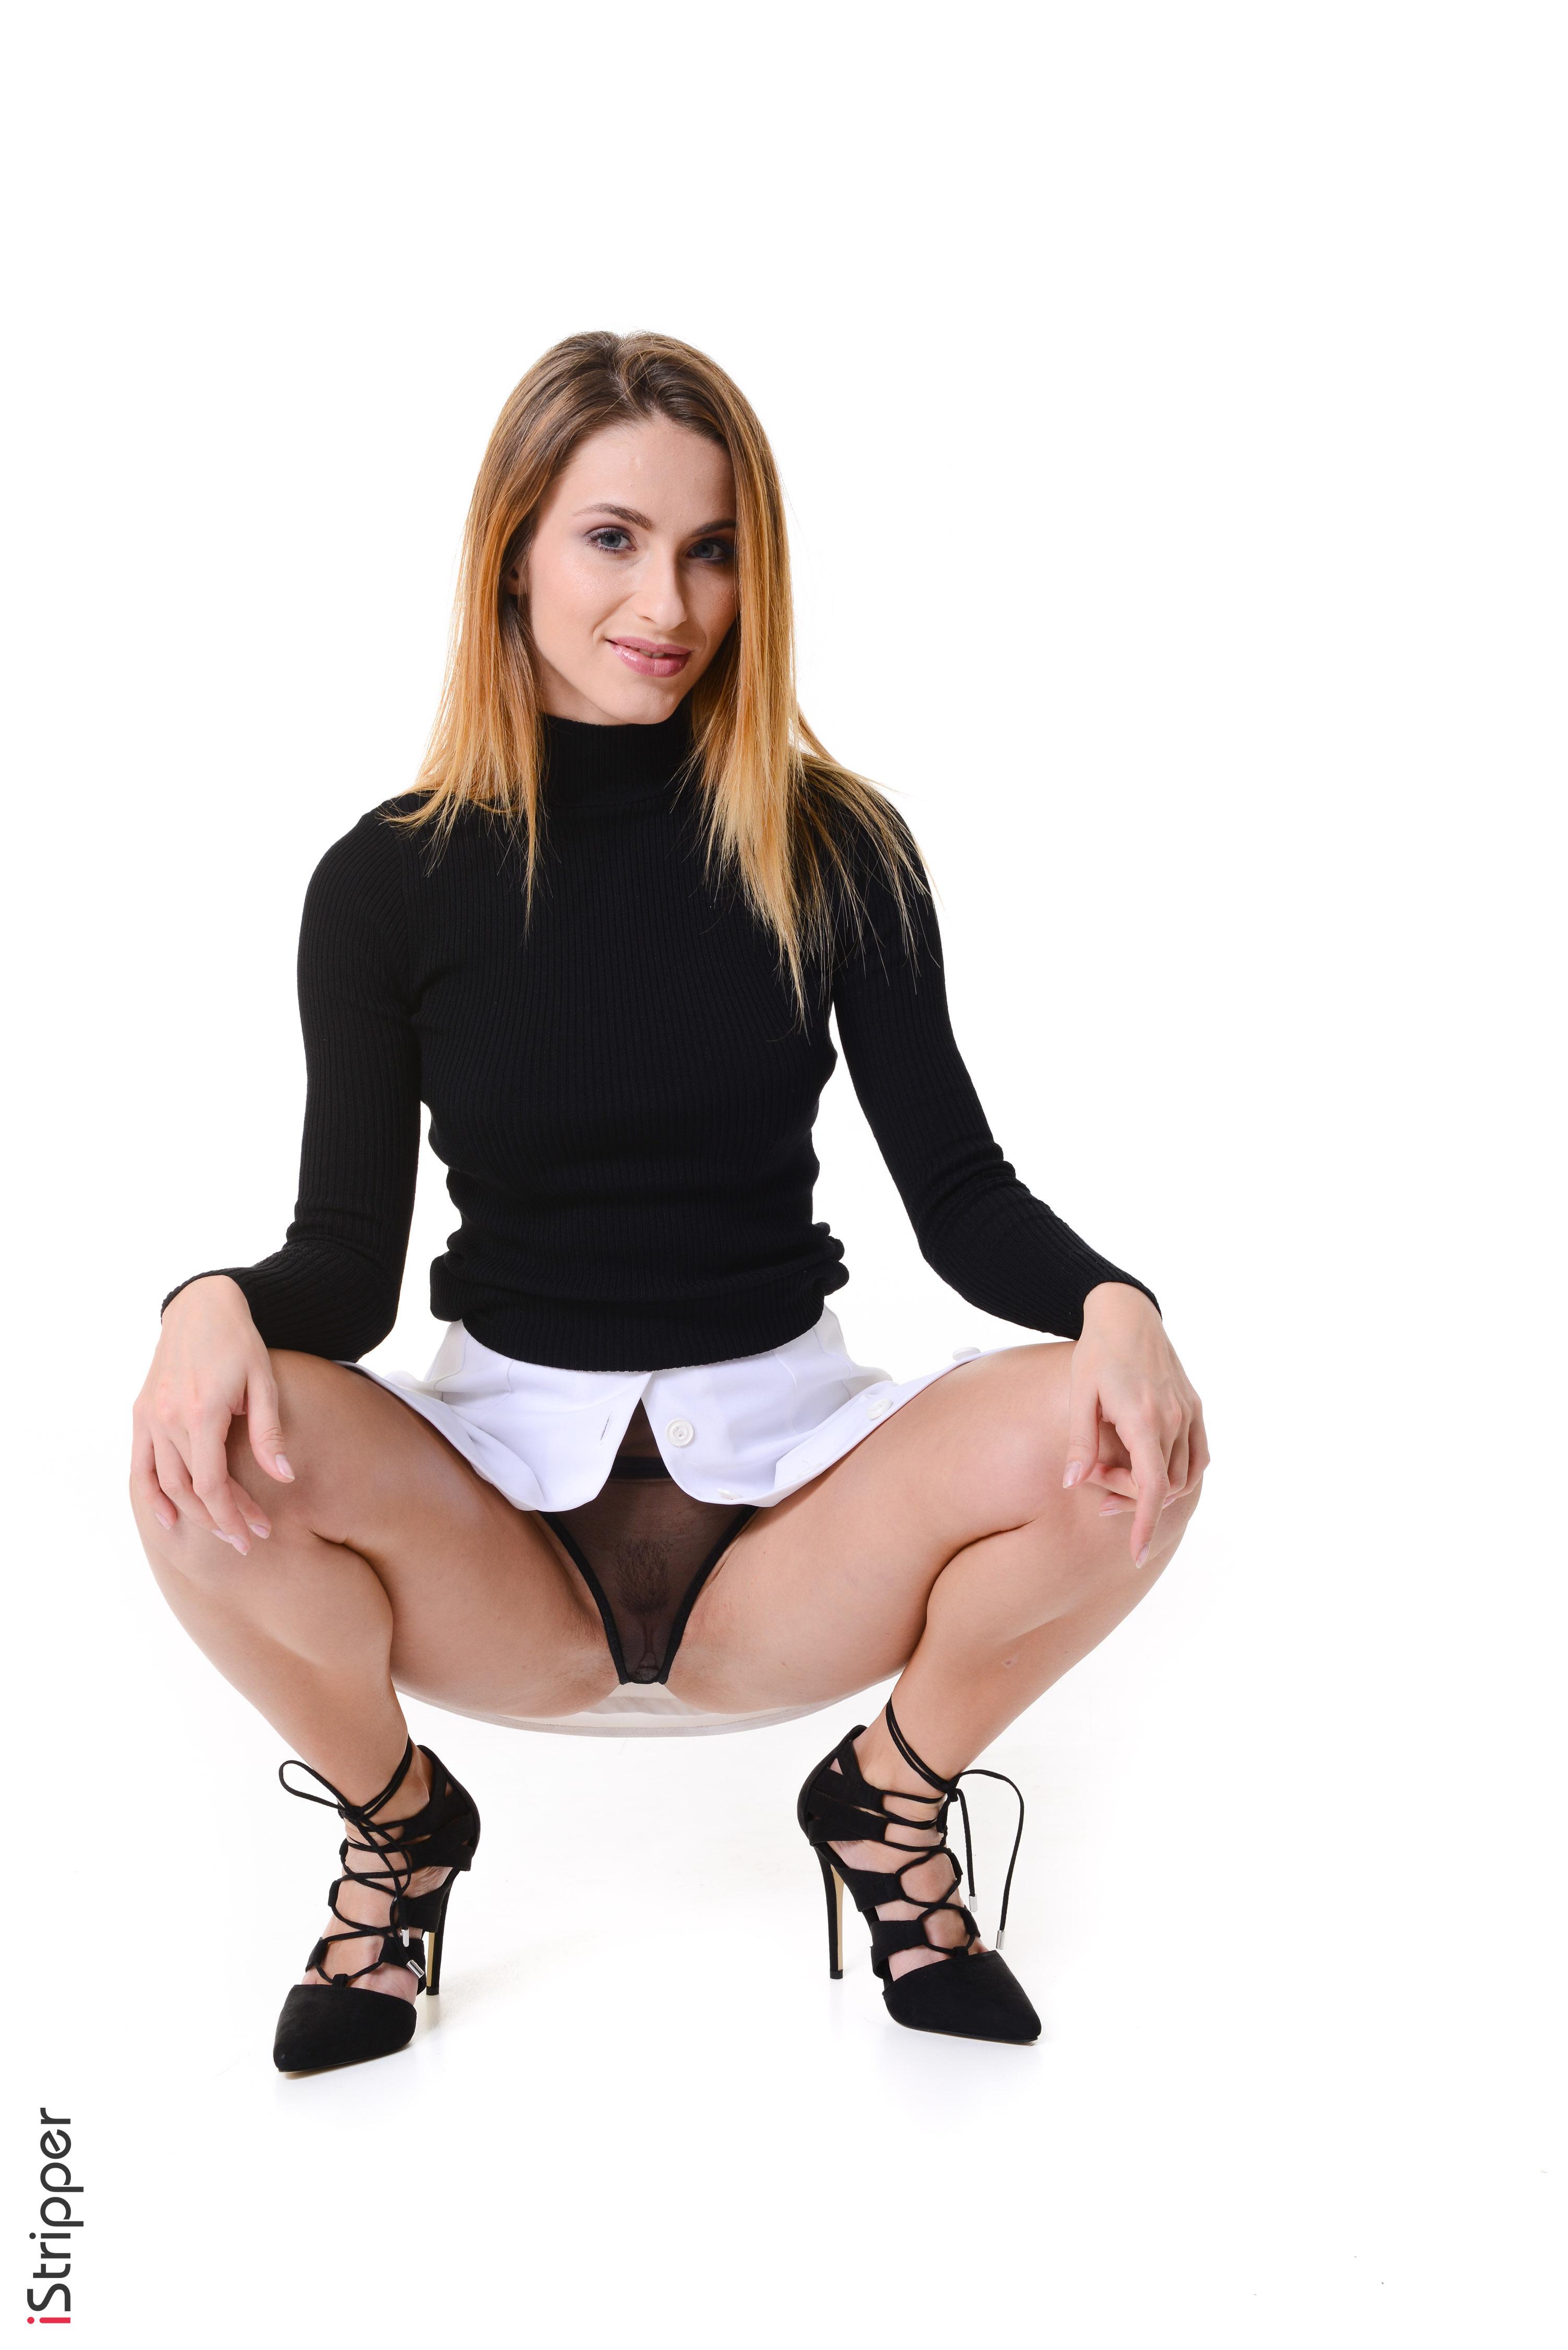 virtual girl desktop stripper dancing porn